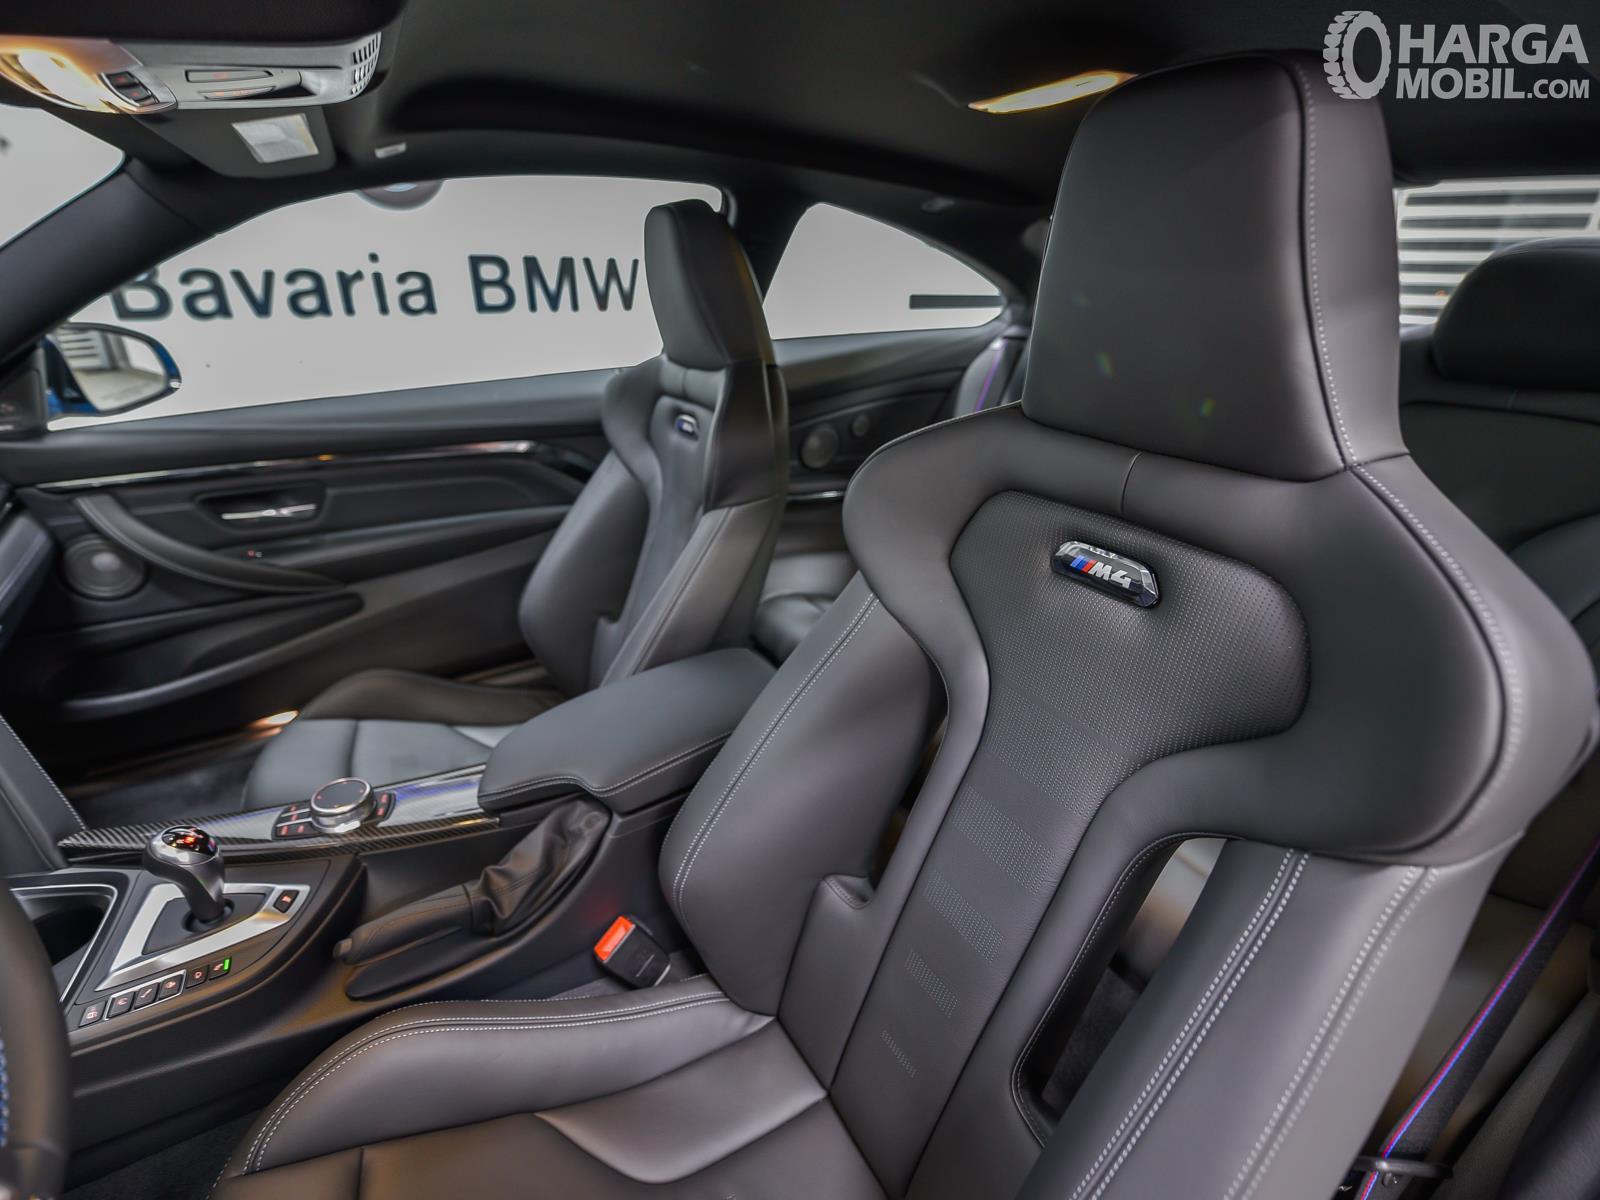 Foto jok depan New BMW M4 CS RWD Coupe 2019